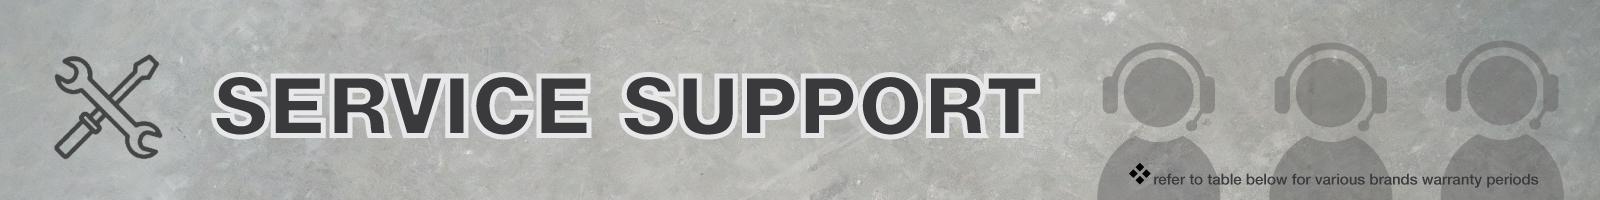 Header-Banner-for-Service-Support-1